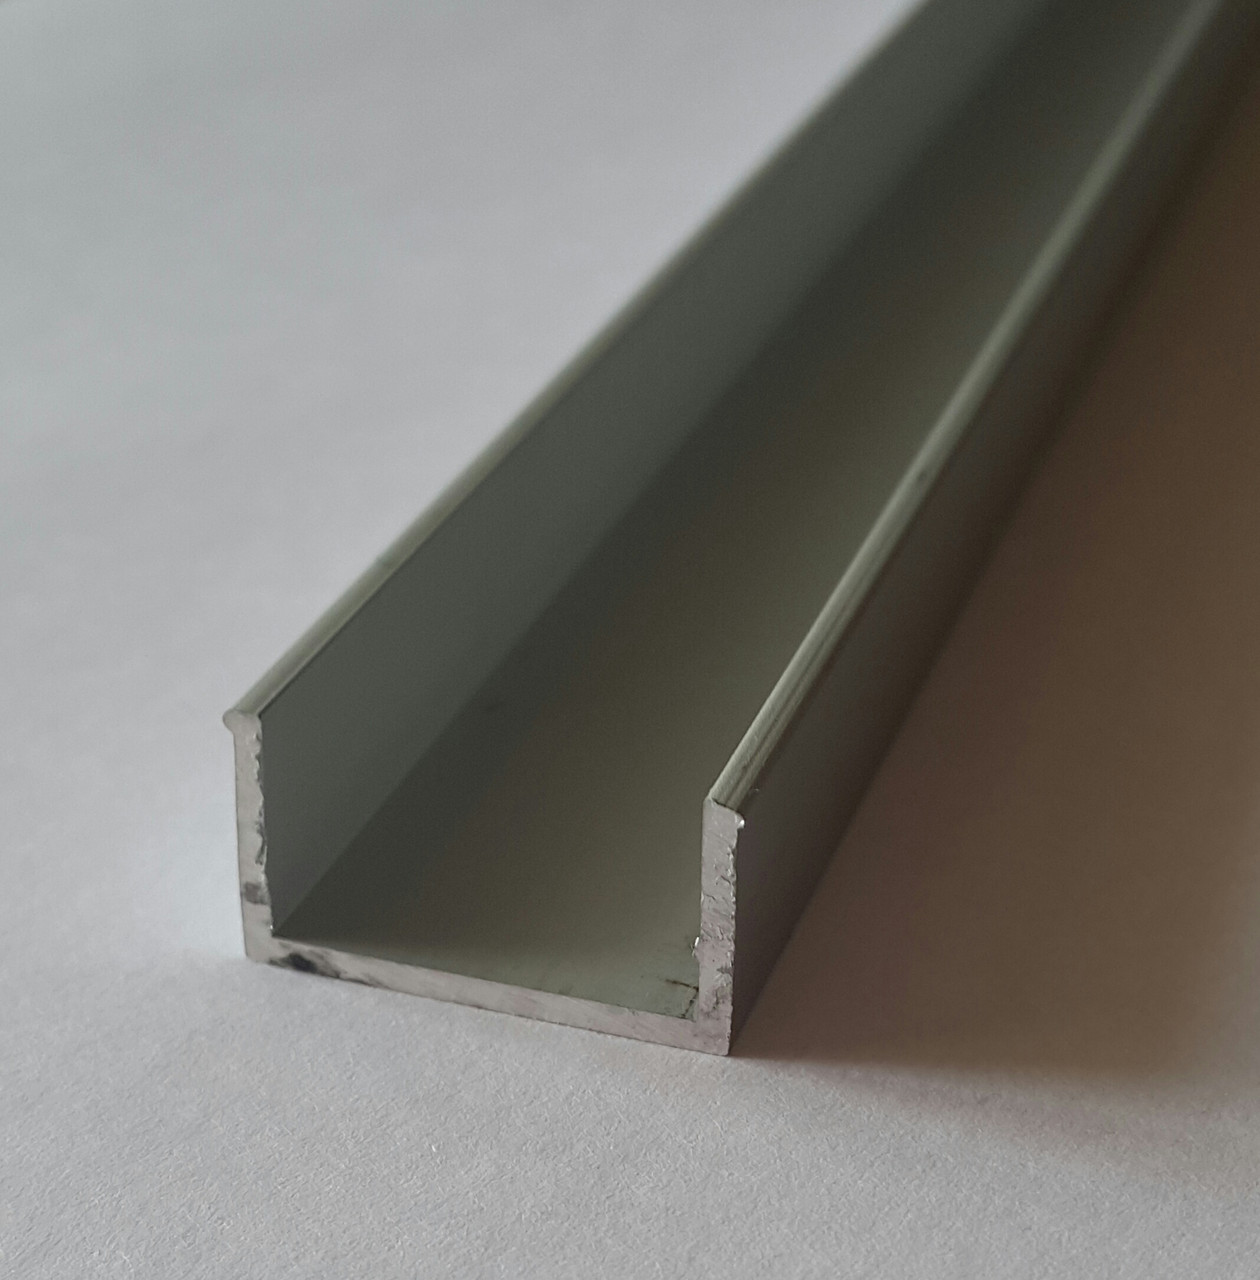 Алюминиевый швеллер 18мм х 18мм х 1мм